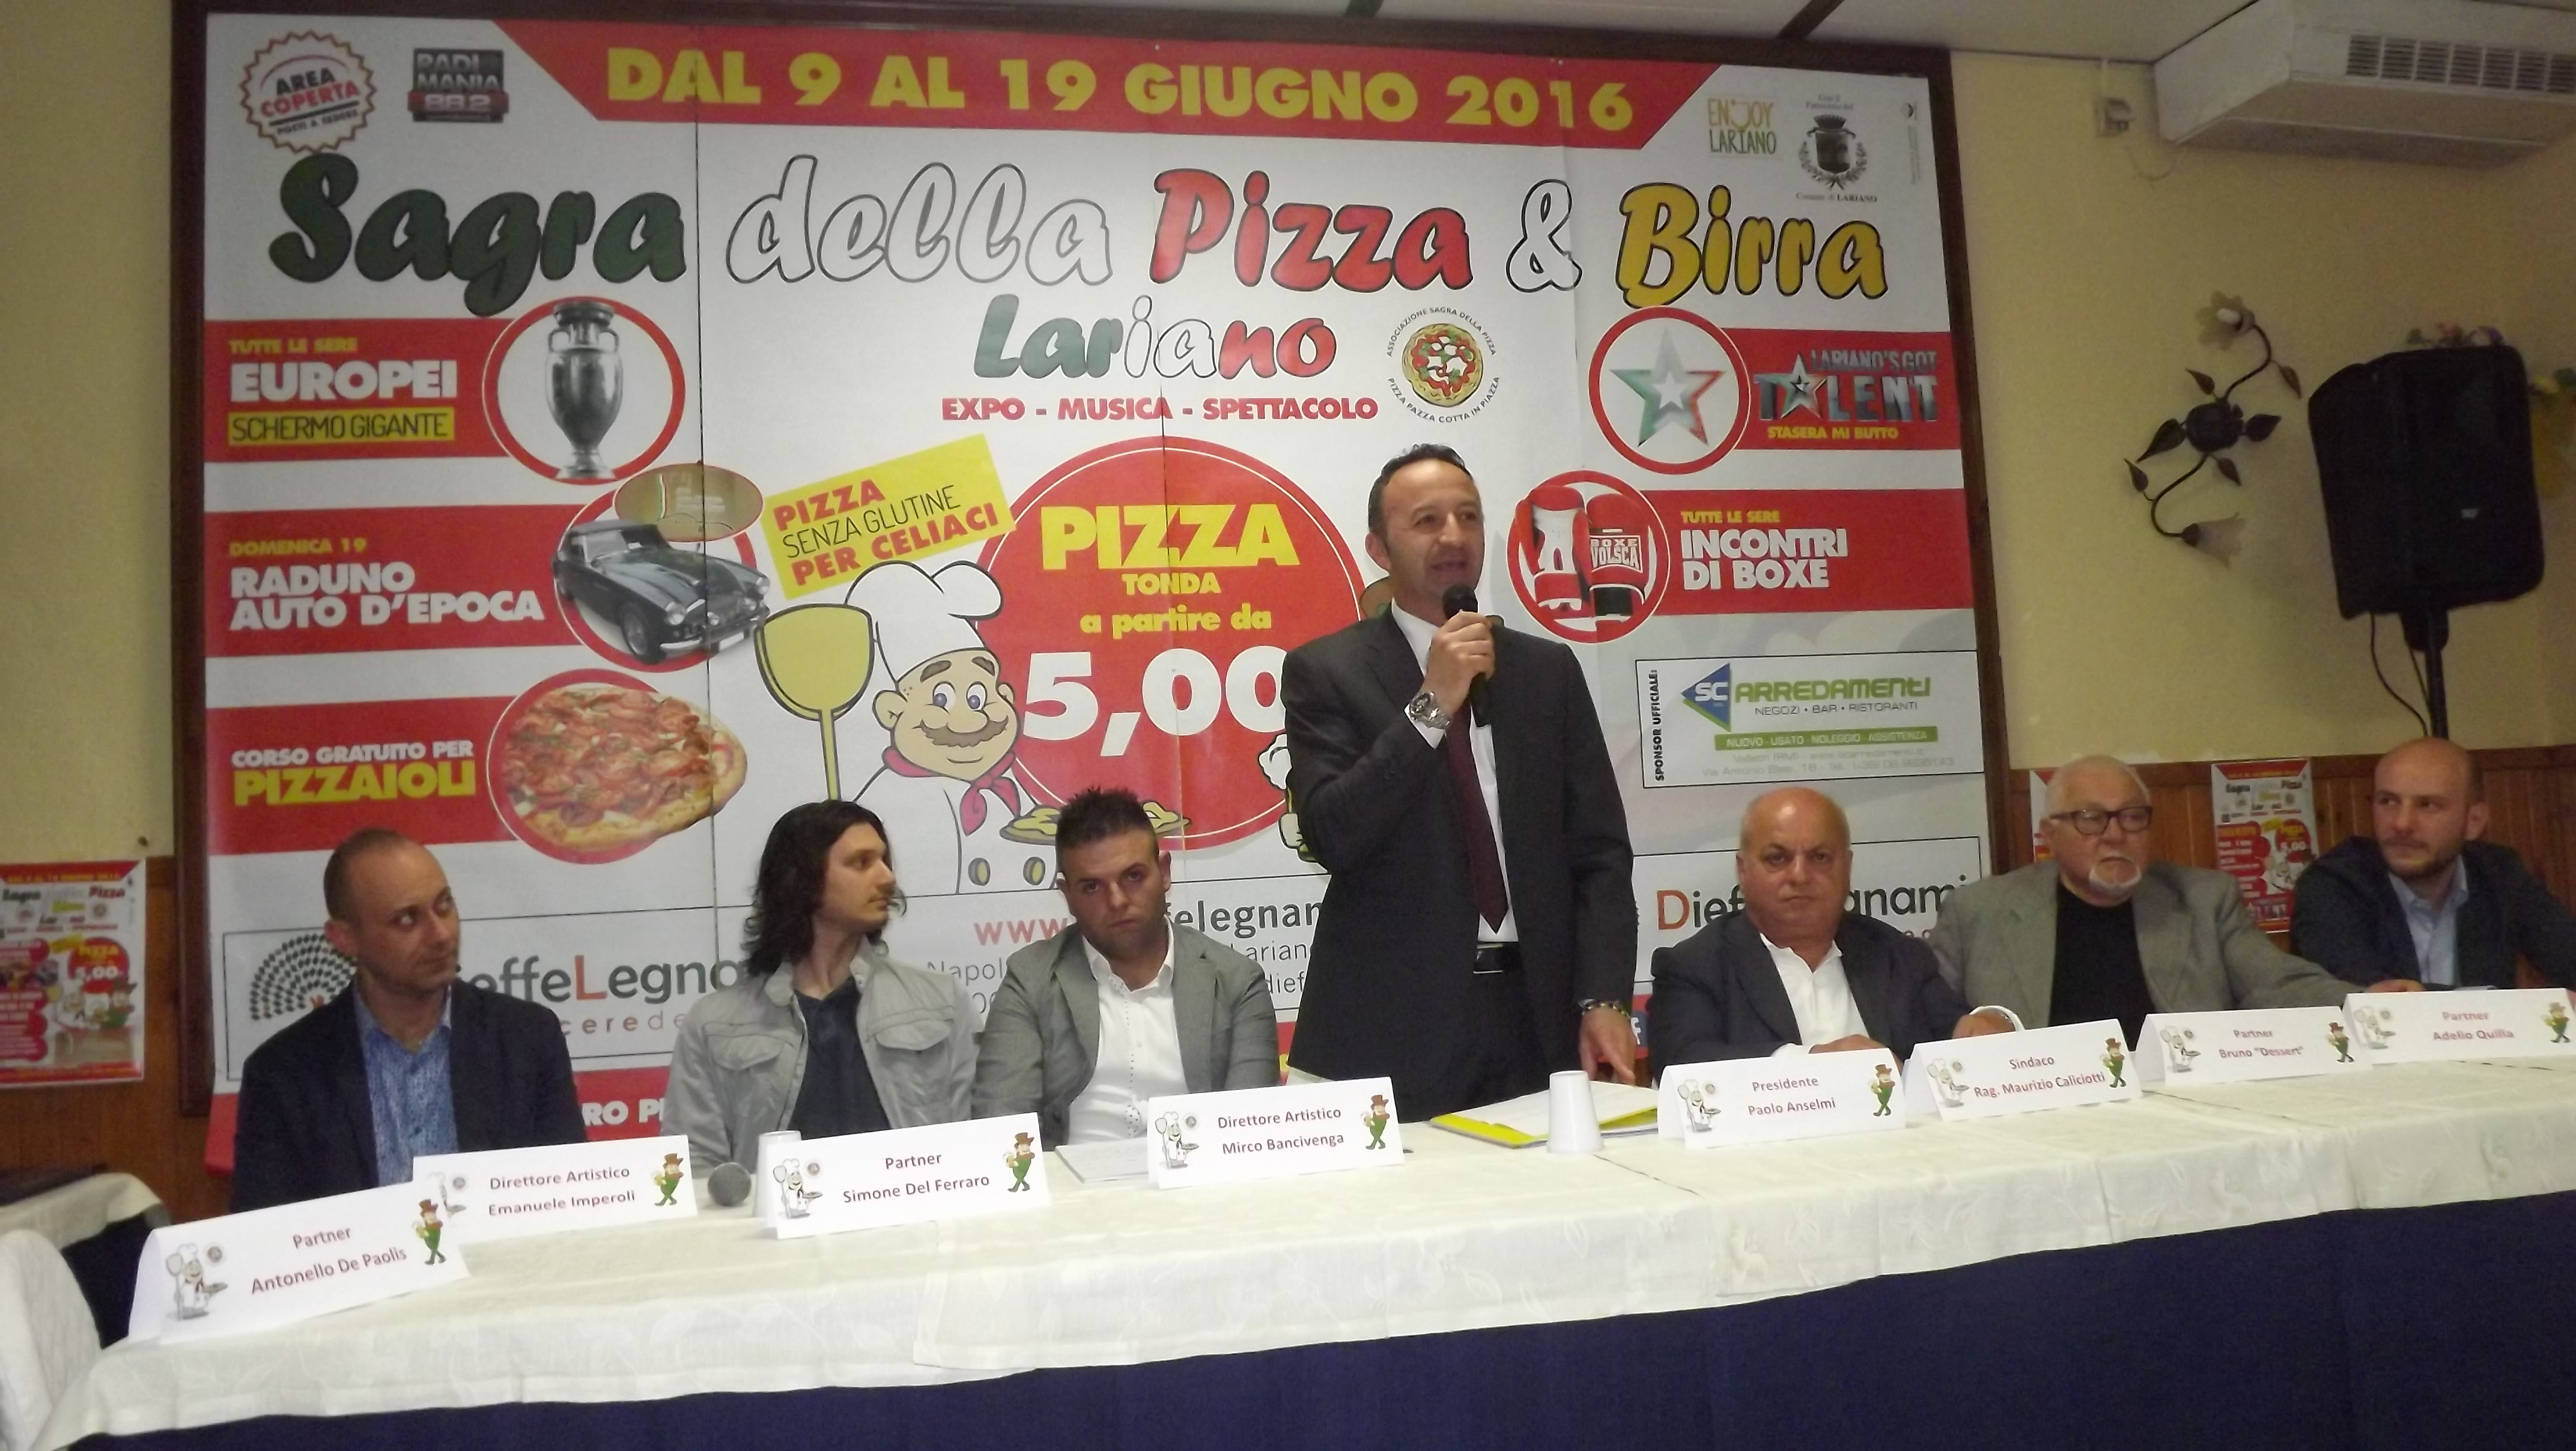 UN MOMENTO CONFERENZA INTERVENTO DEL PRESIDENTE PAOLO ANSELMI